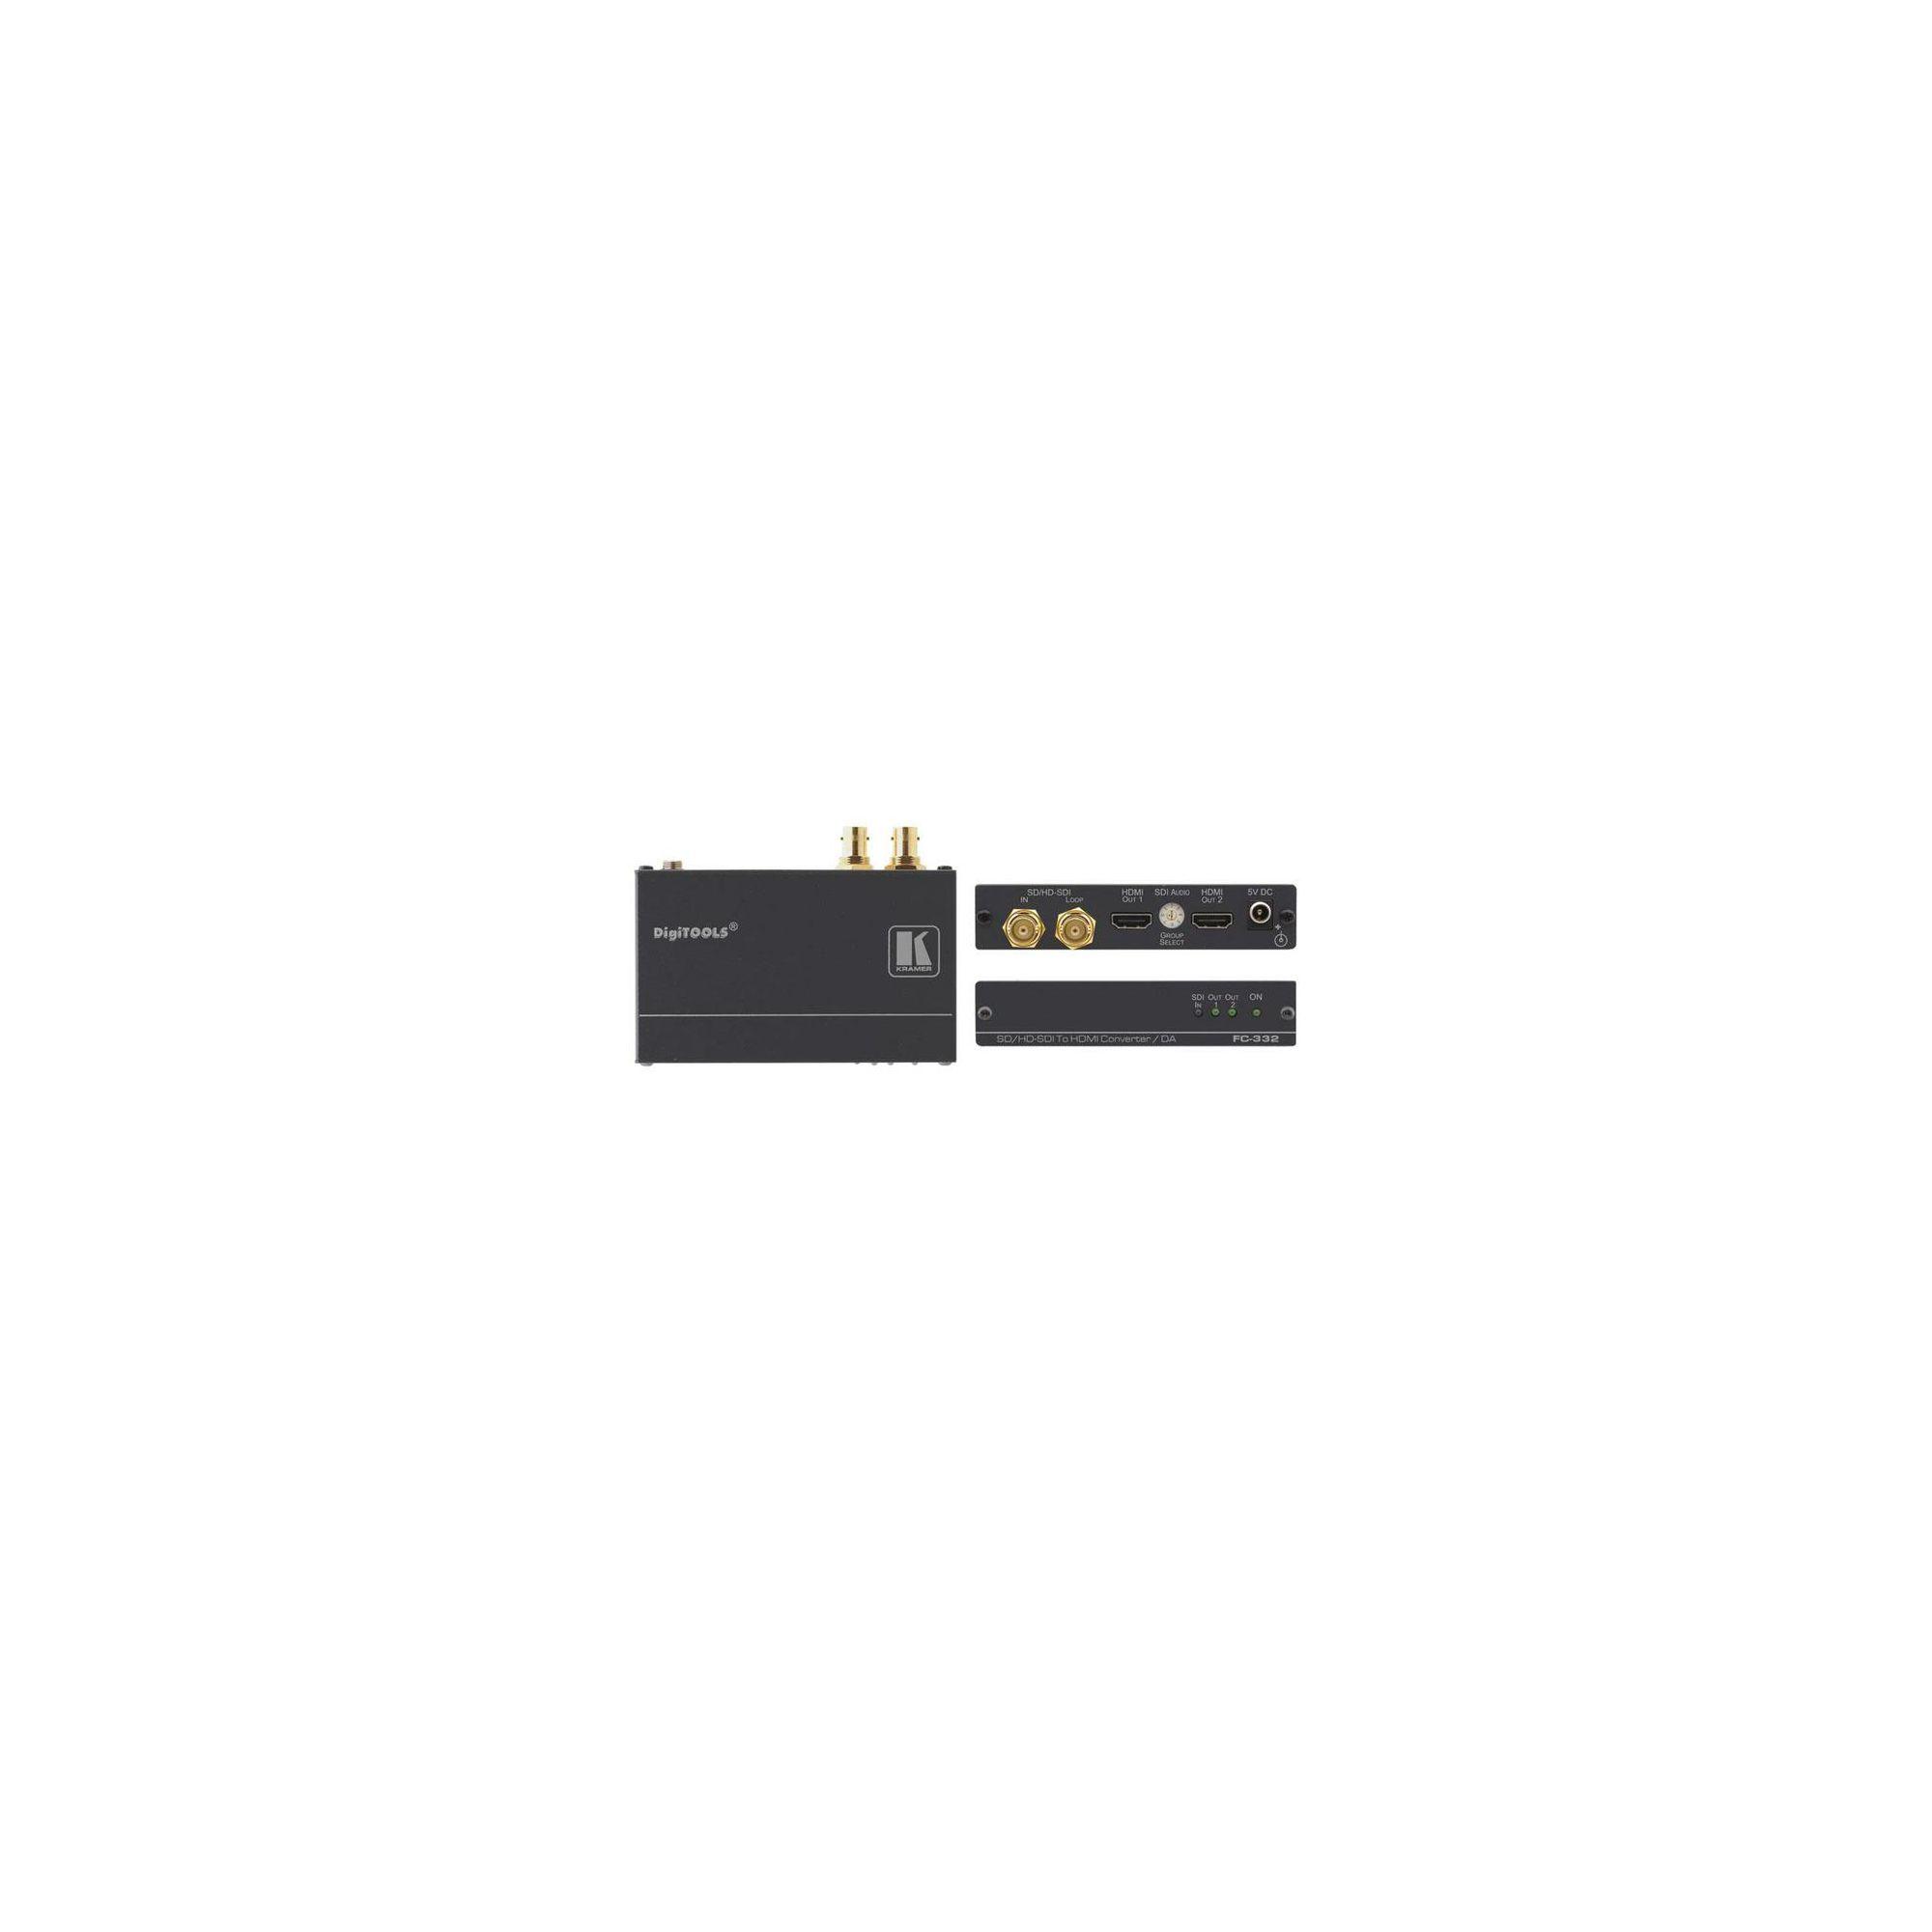 3G HD-SDI TO 2X HDMI CONVERTOR at Tesco Direct